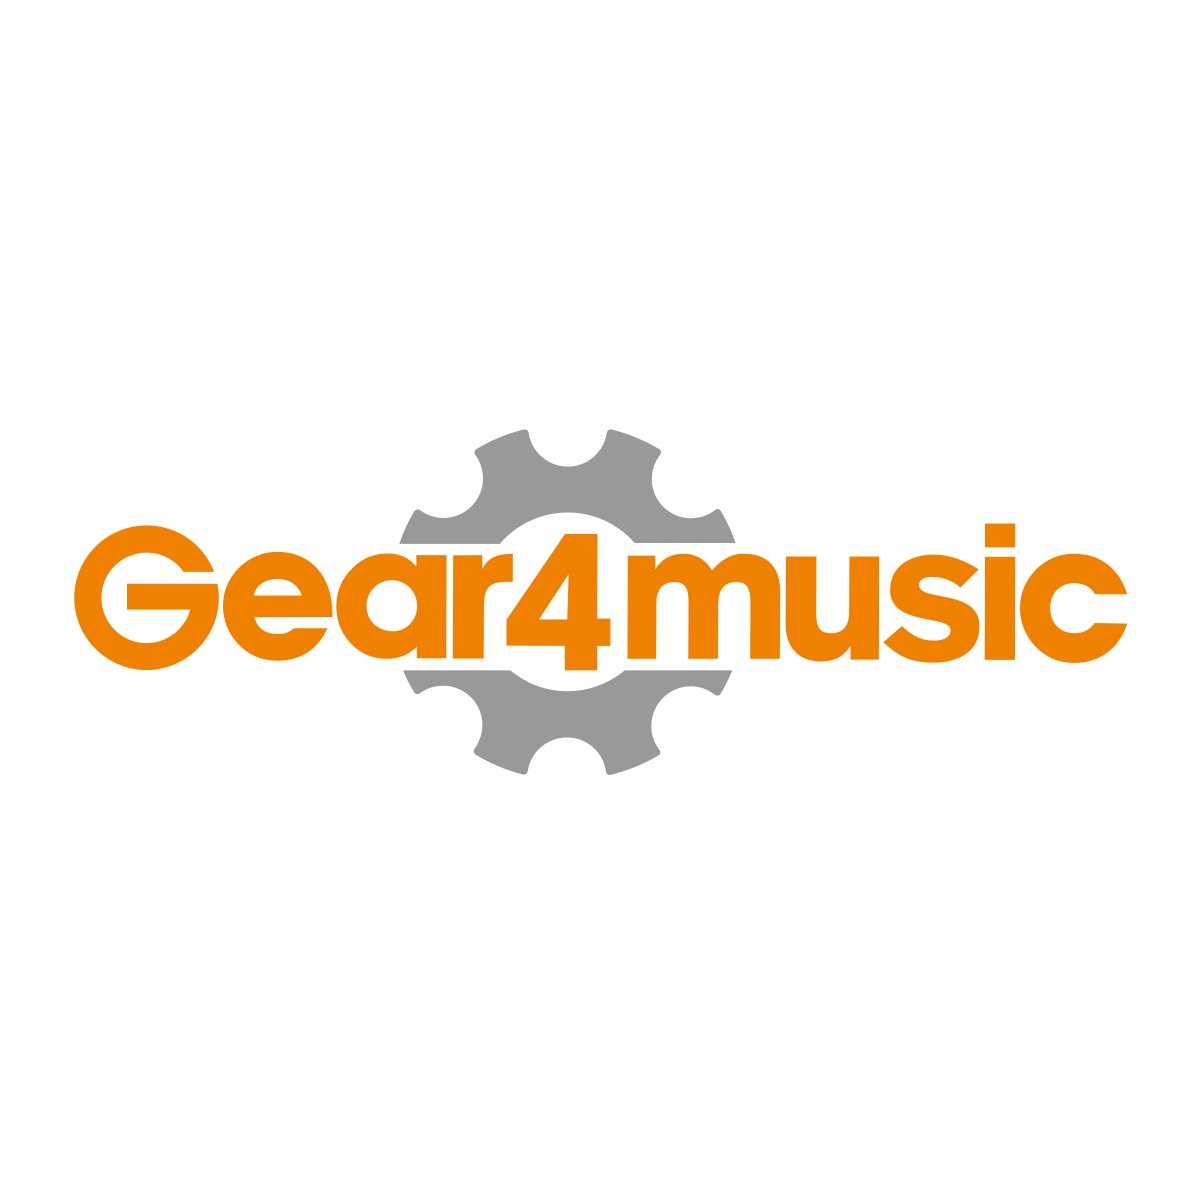 Guitarra electro-acústica Gear4music para canhotos